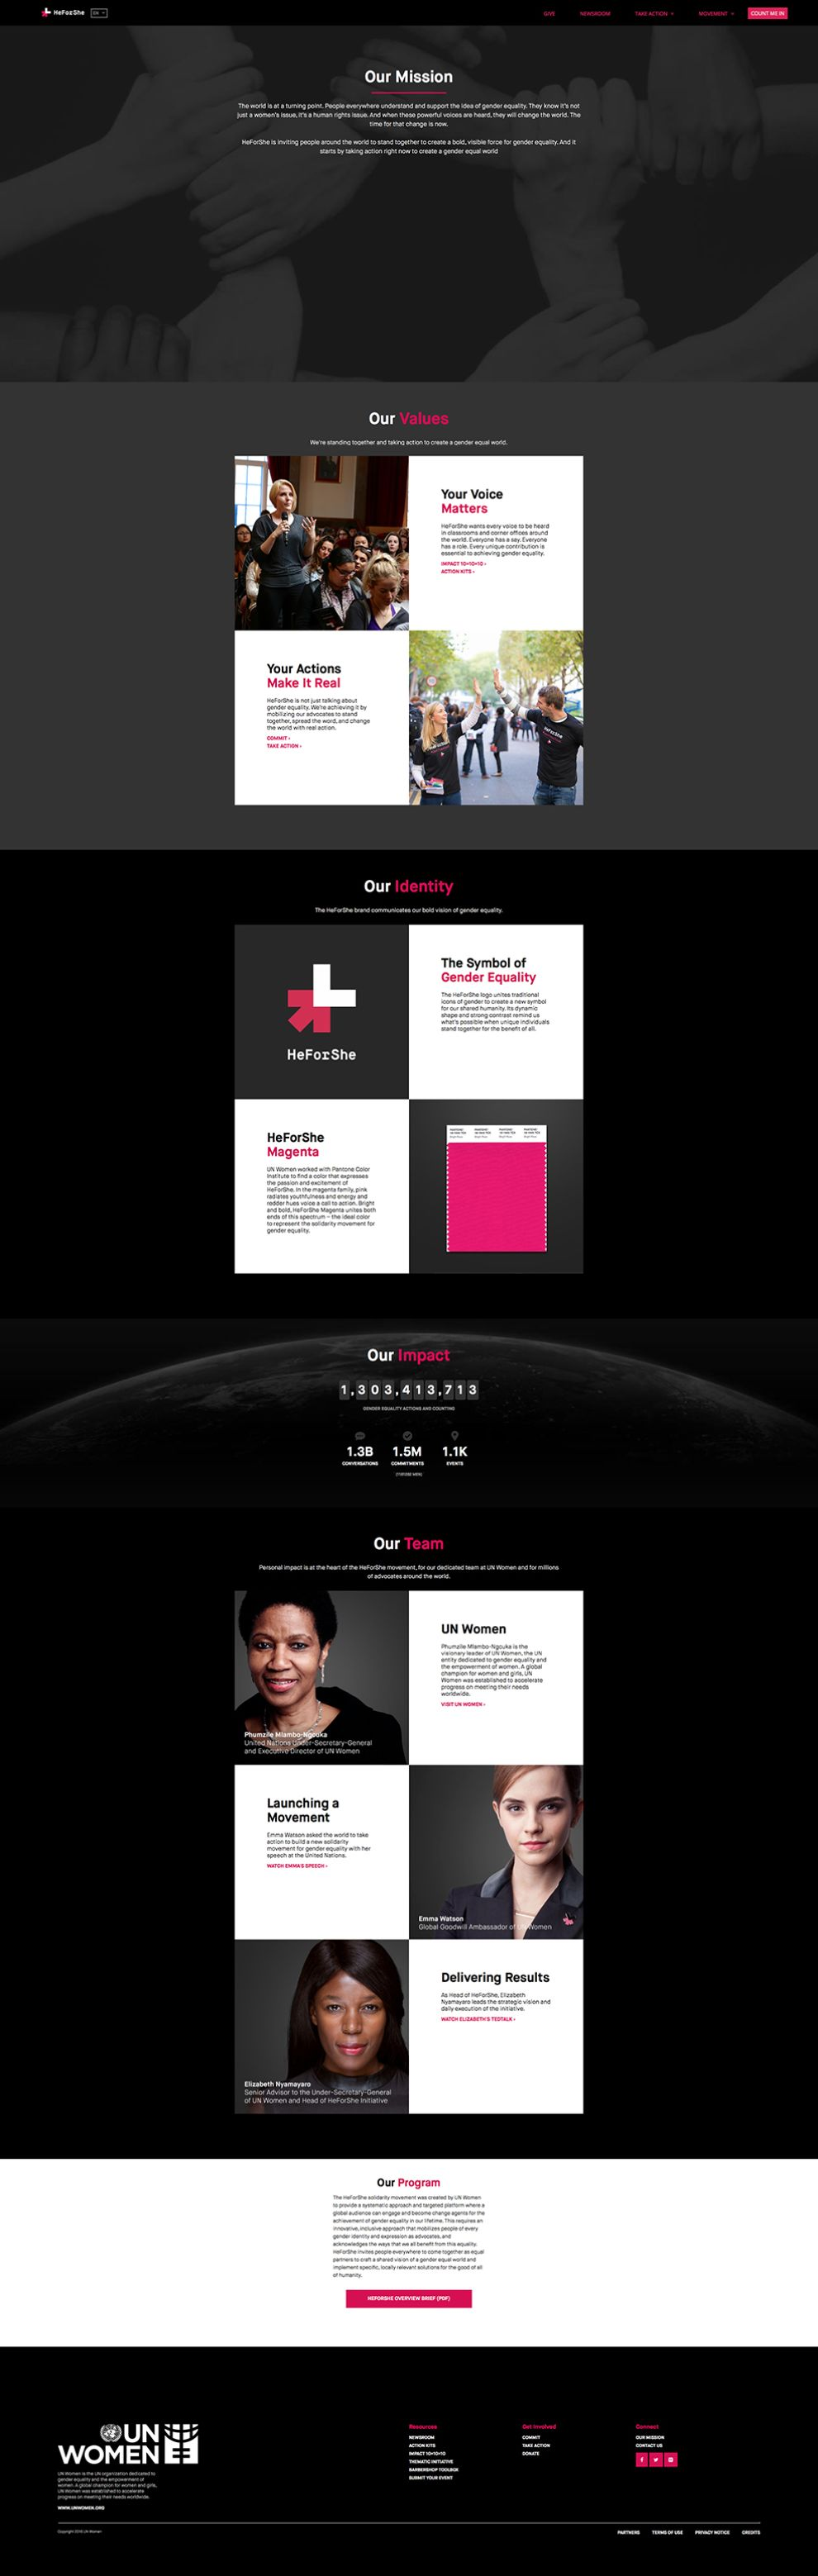 HeForShe Beautiful Product Page